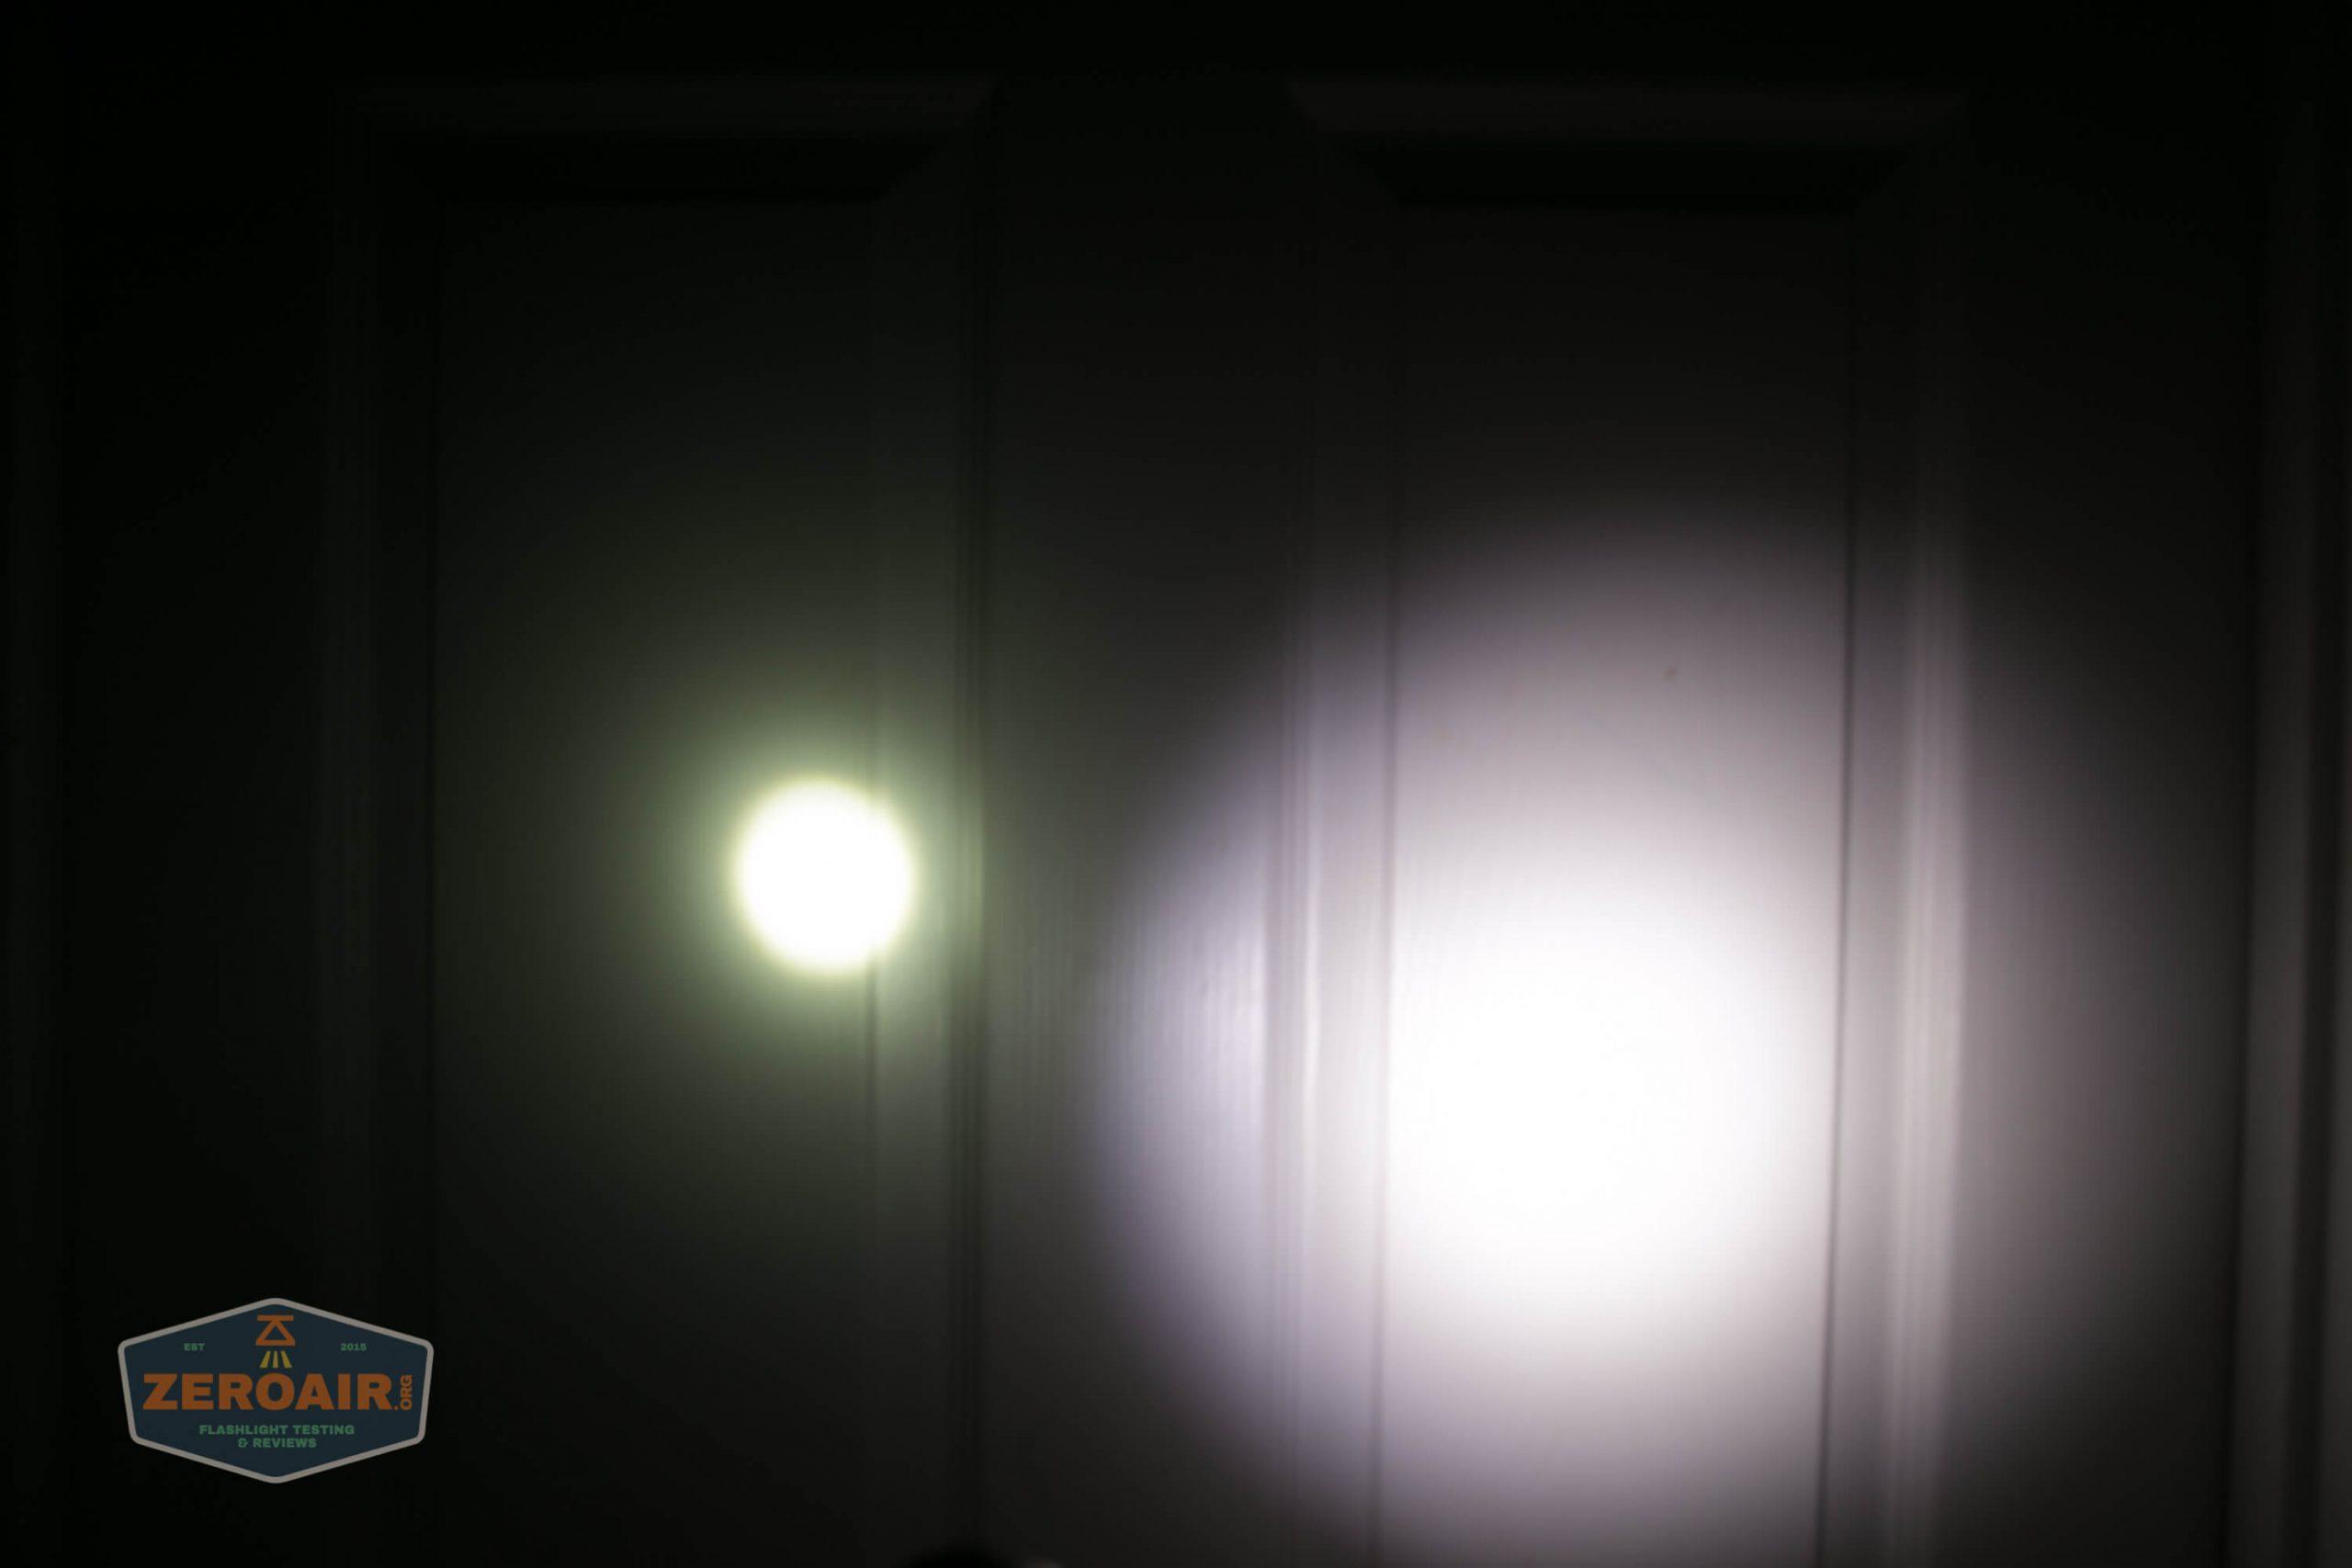 acebeam l17 osram white 18650 thrower door beamshot beside blf-348